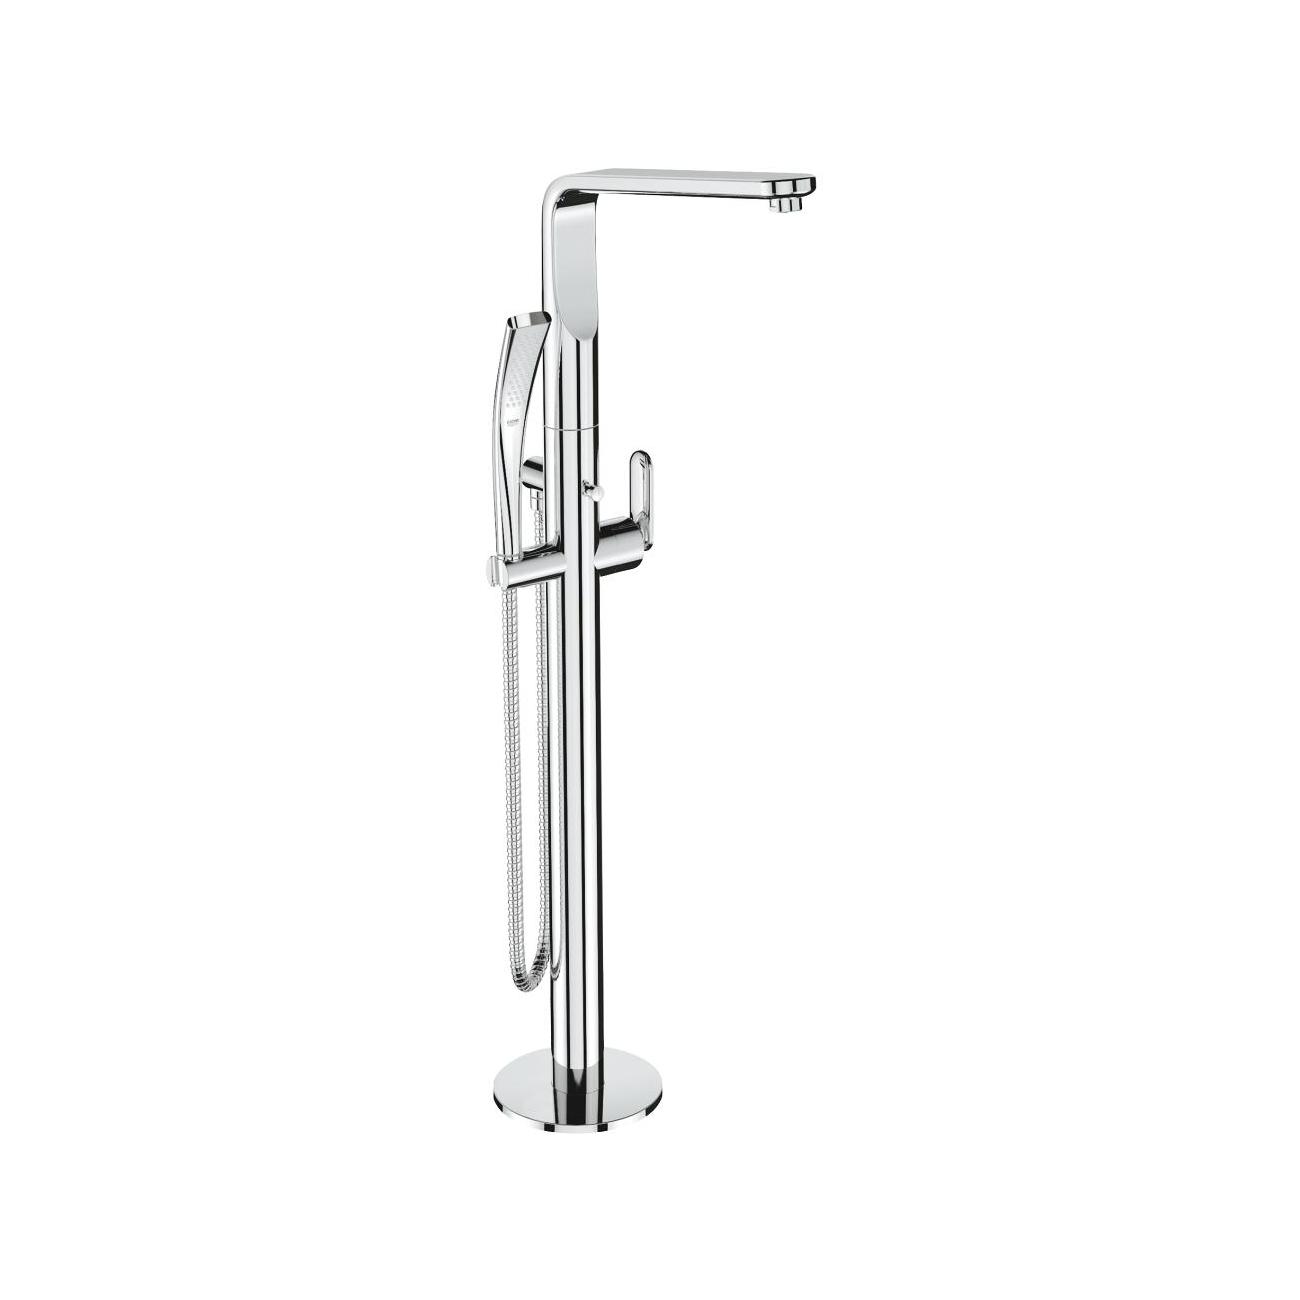 GROHE VERIS  Free standing bath-shower